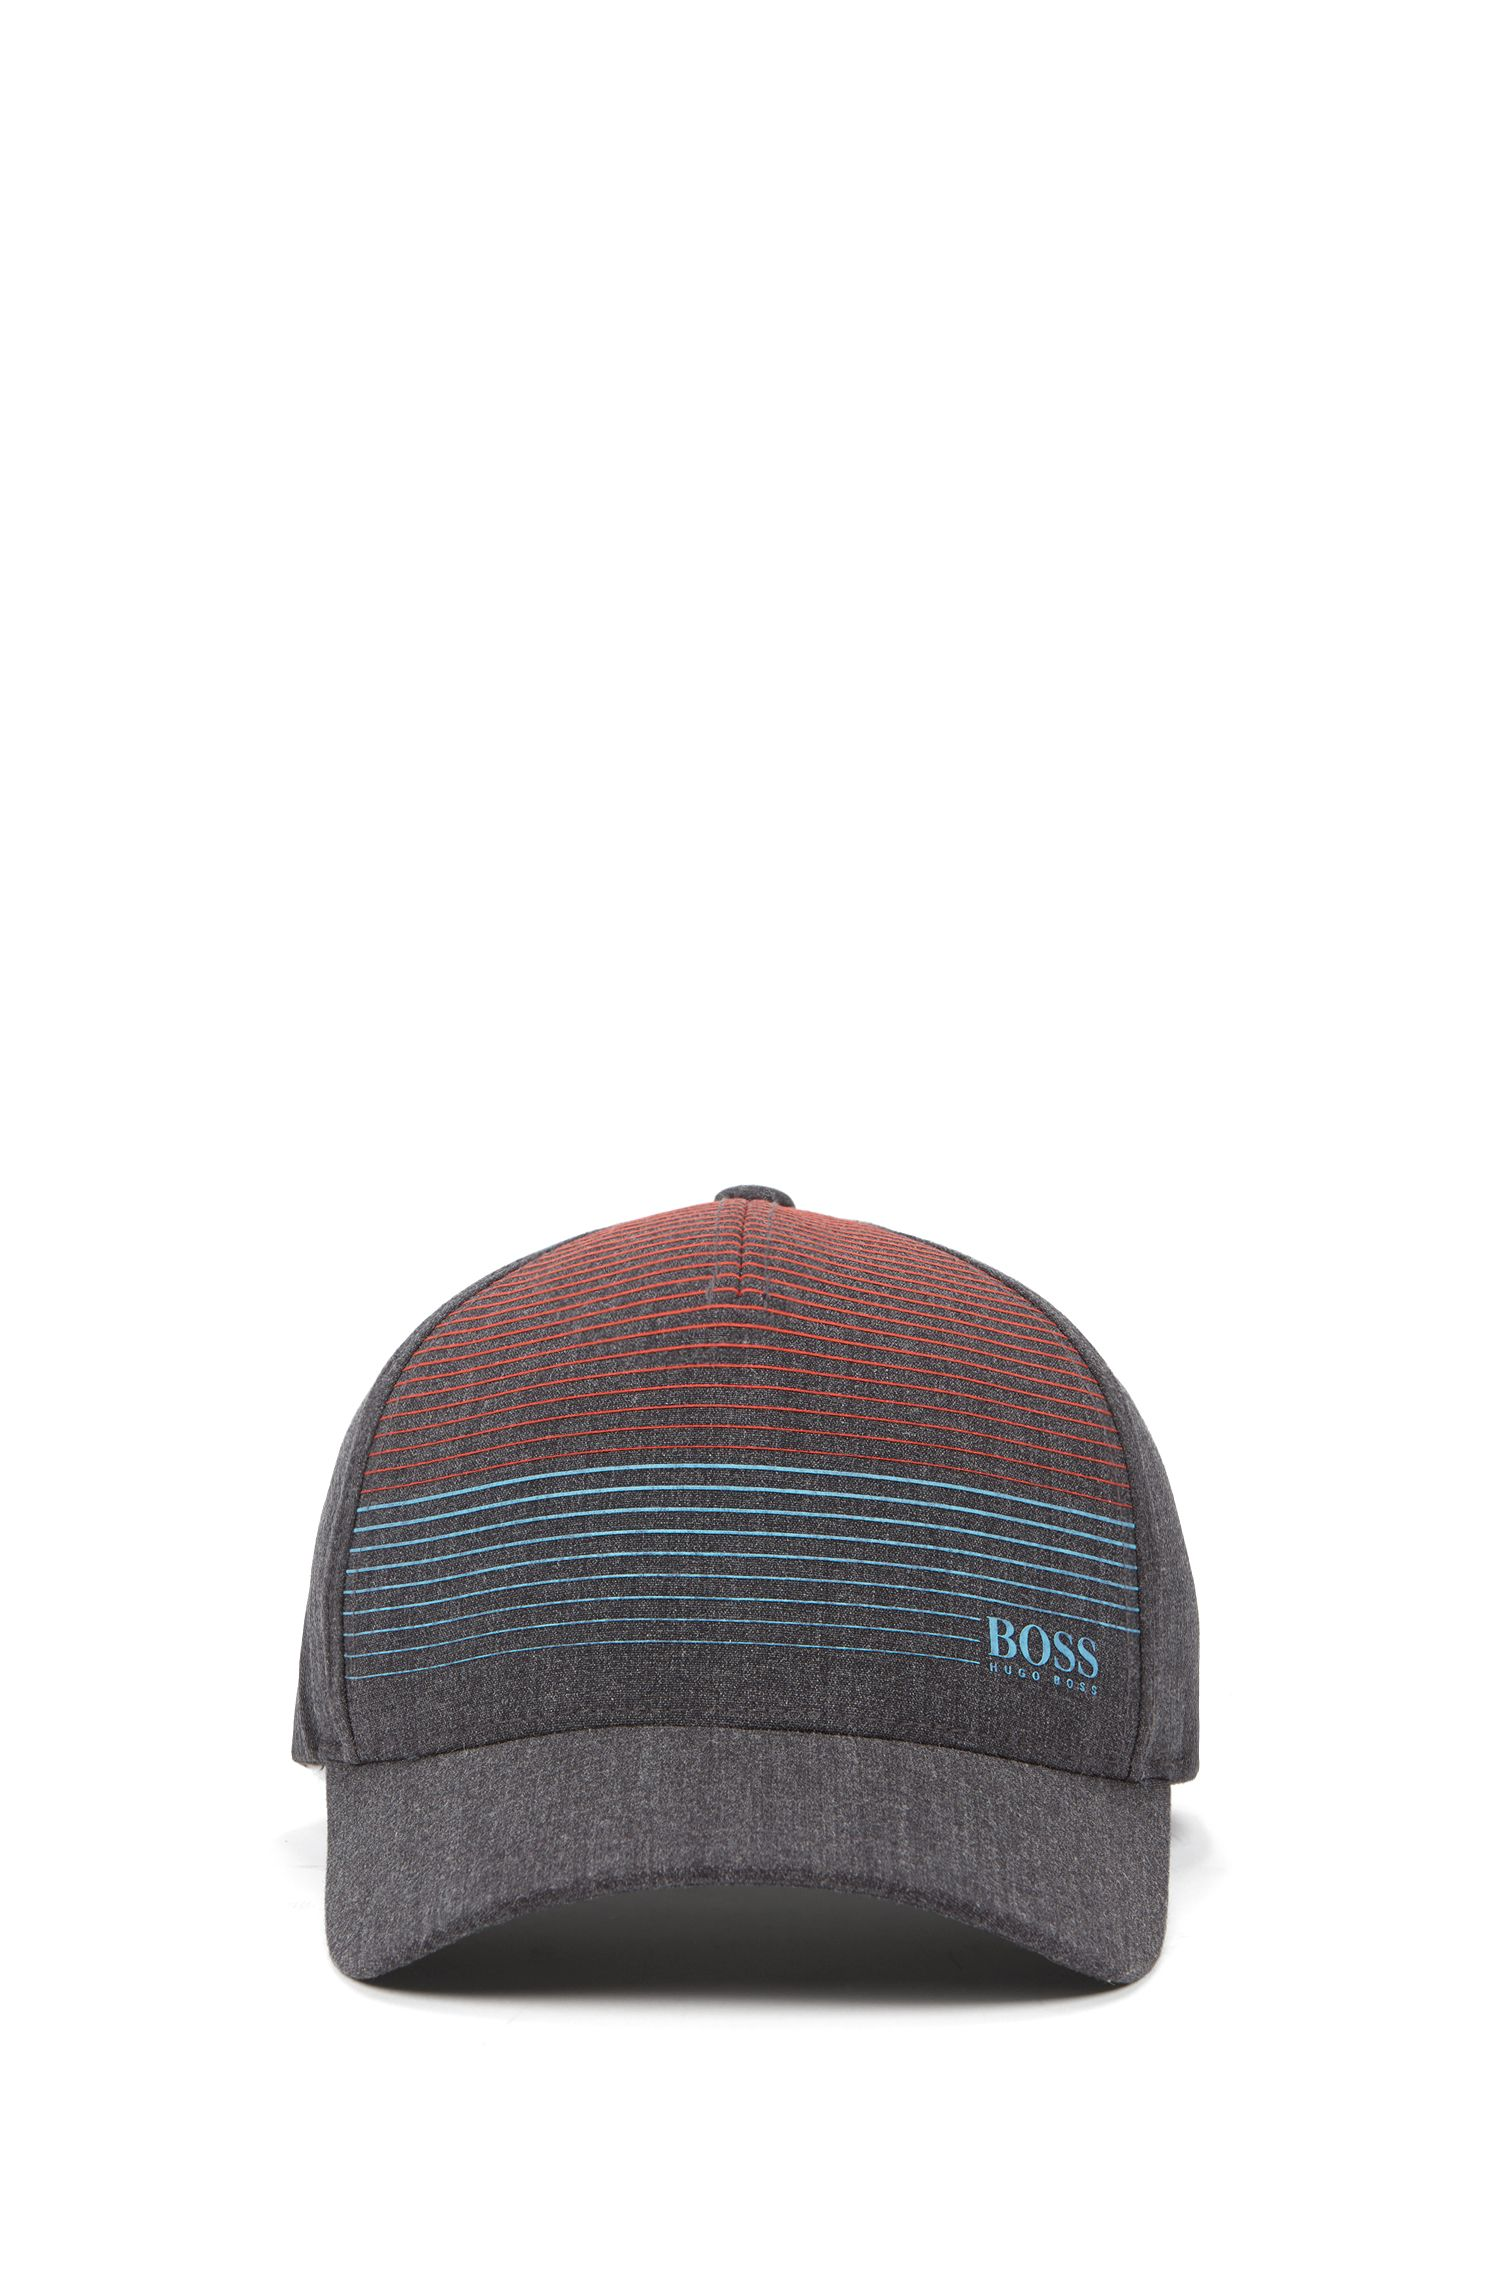 Adjustable cap in stretch melange with rubberized stripe pattern, Grey